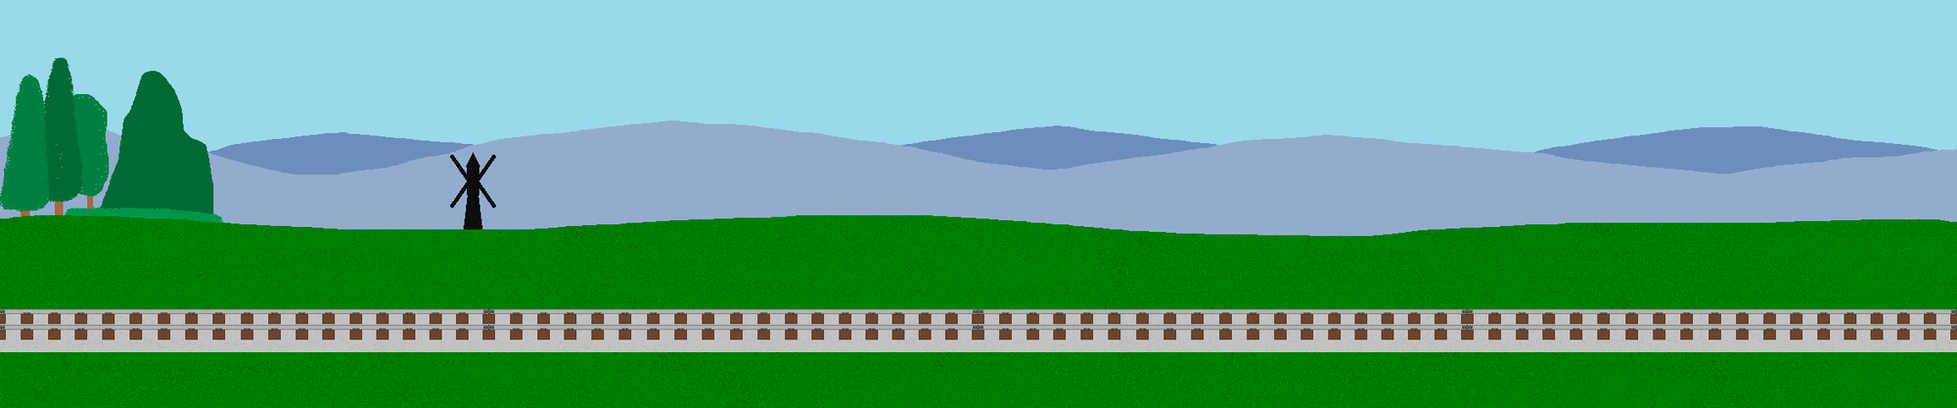 Napoleon's Field by RyanBrony765